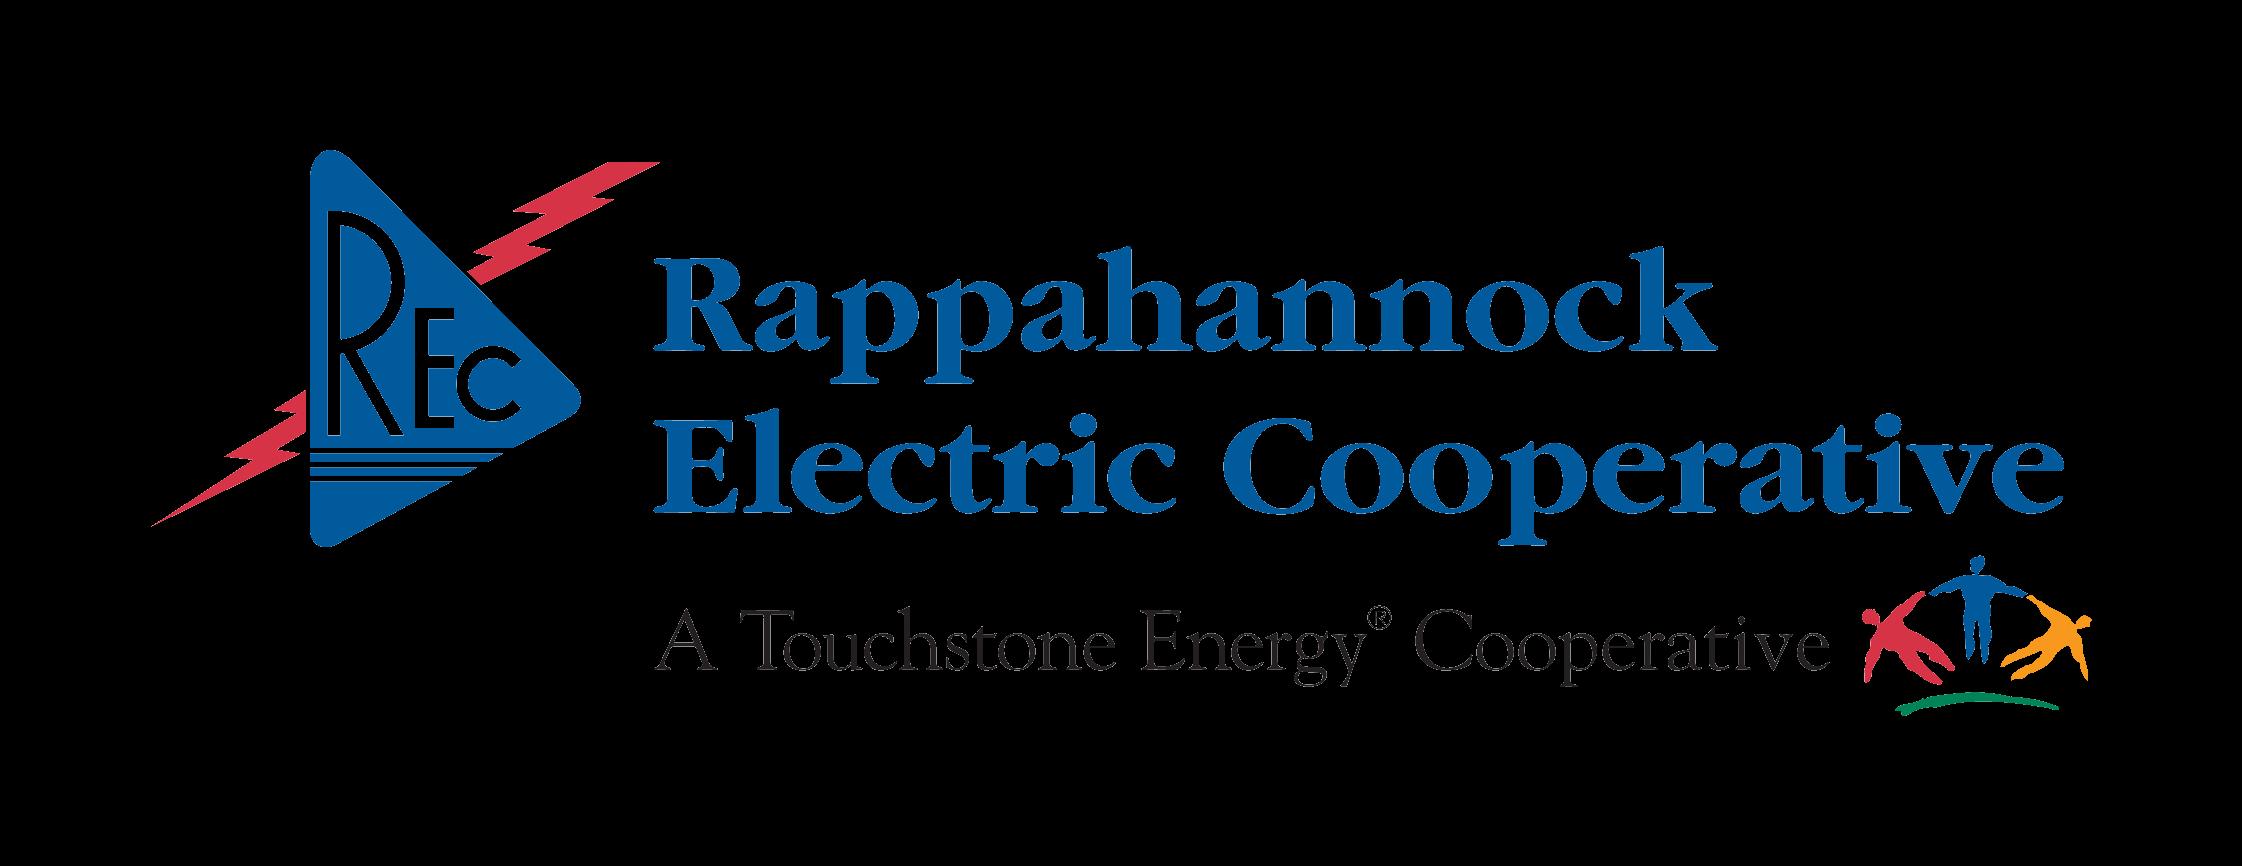 Rapahannock Electric Cooperative